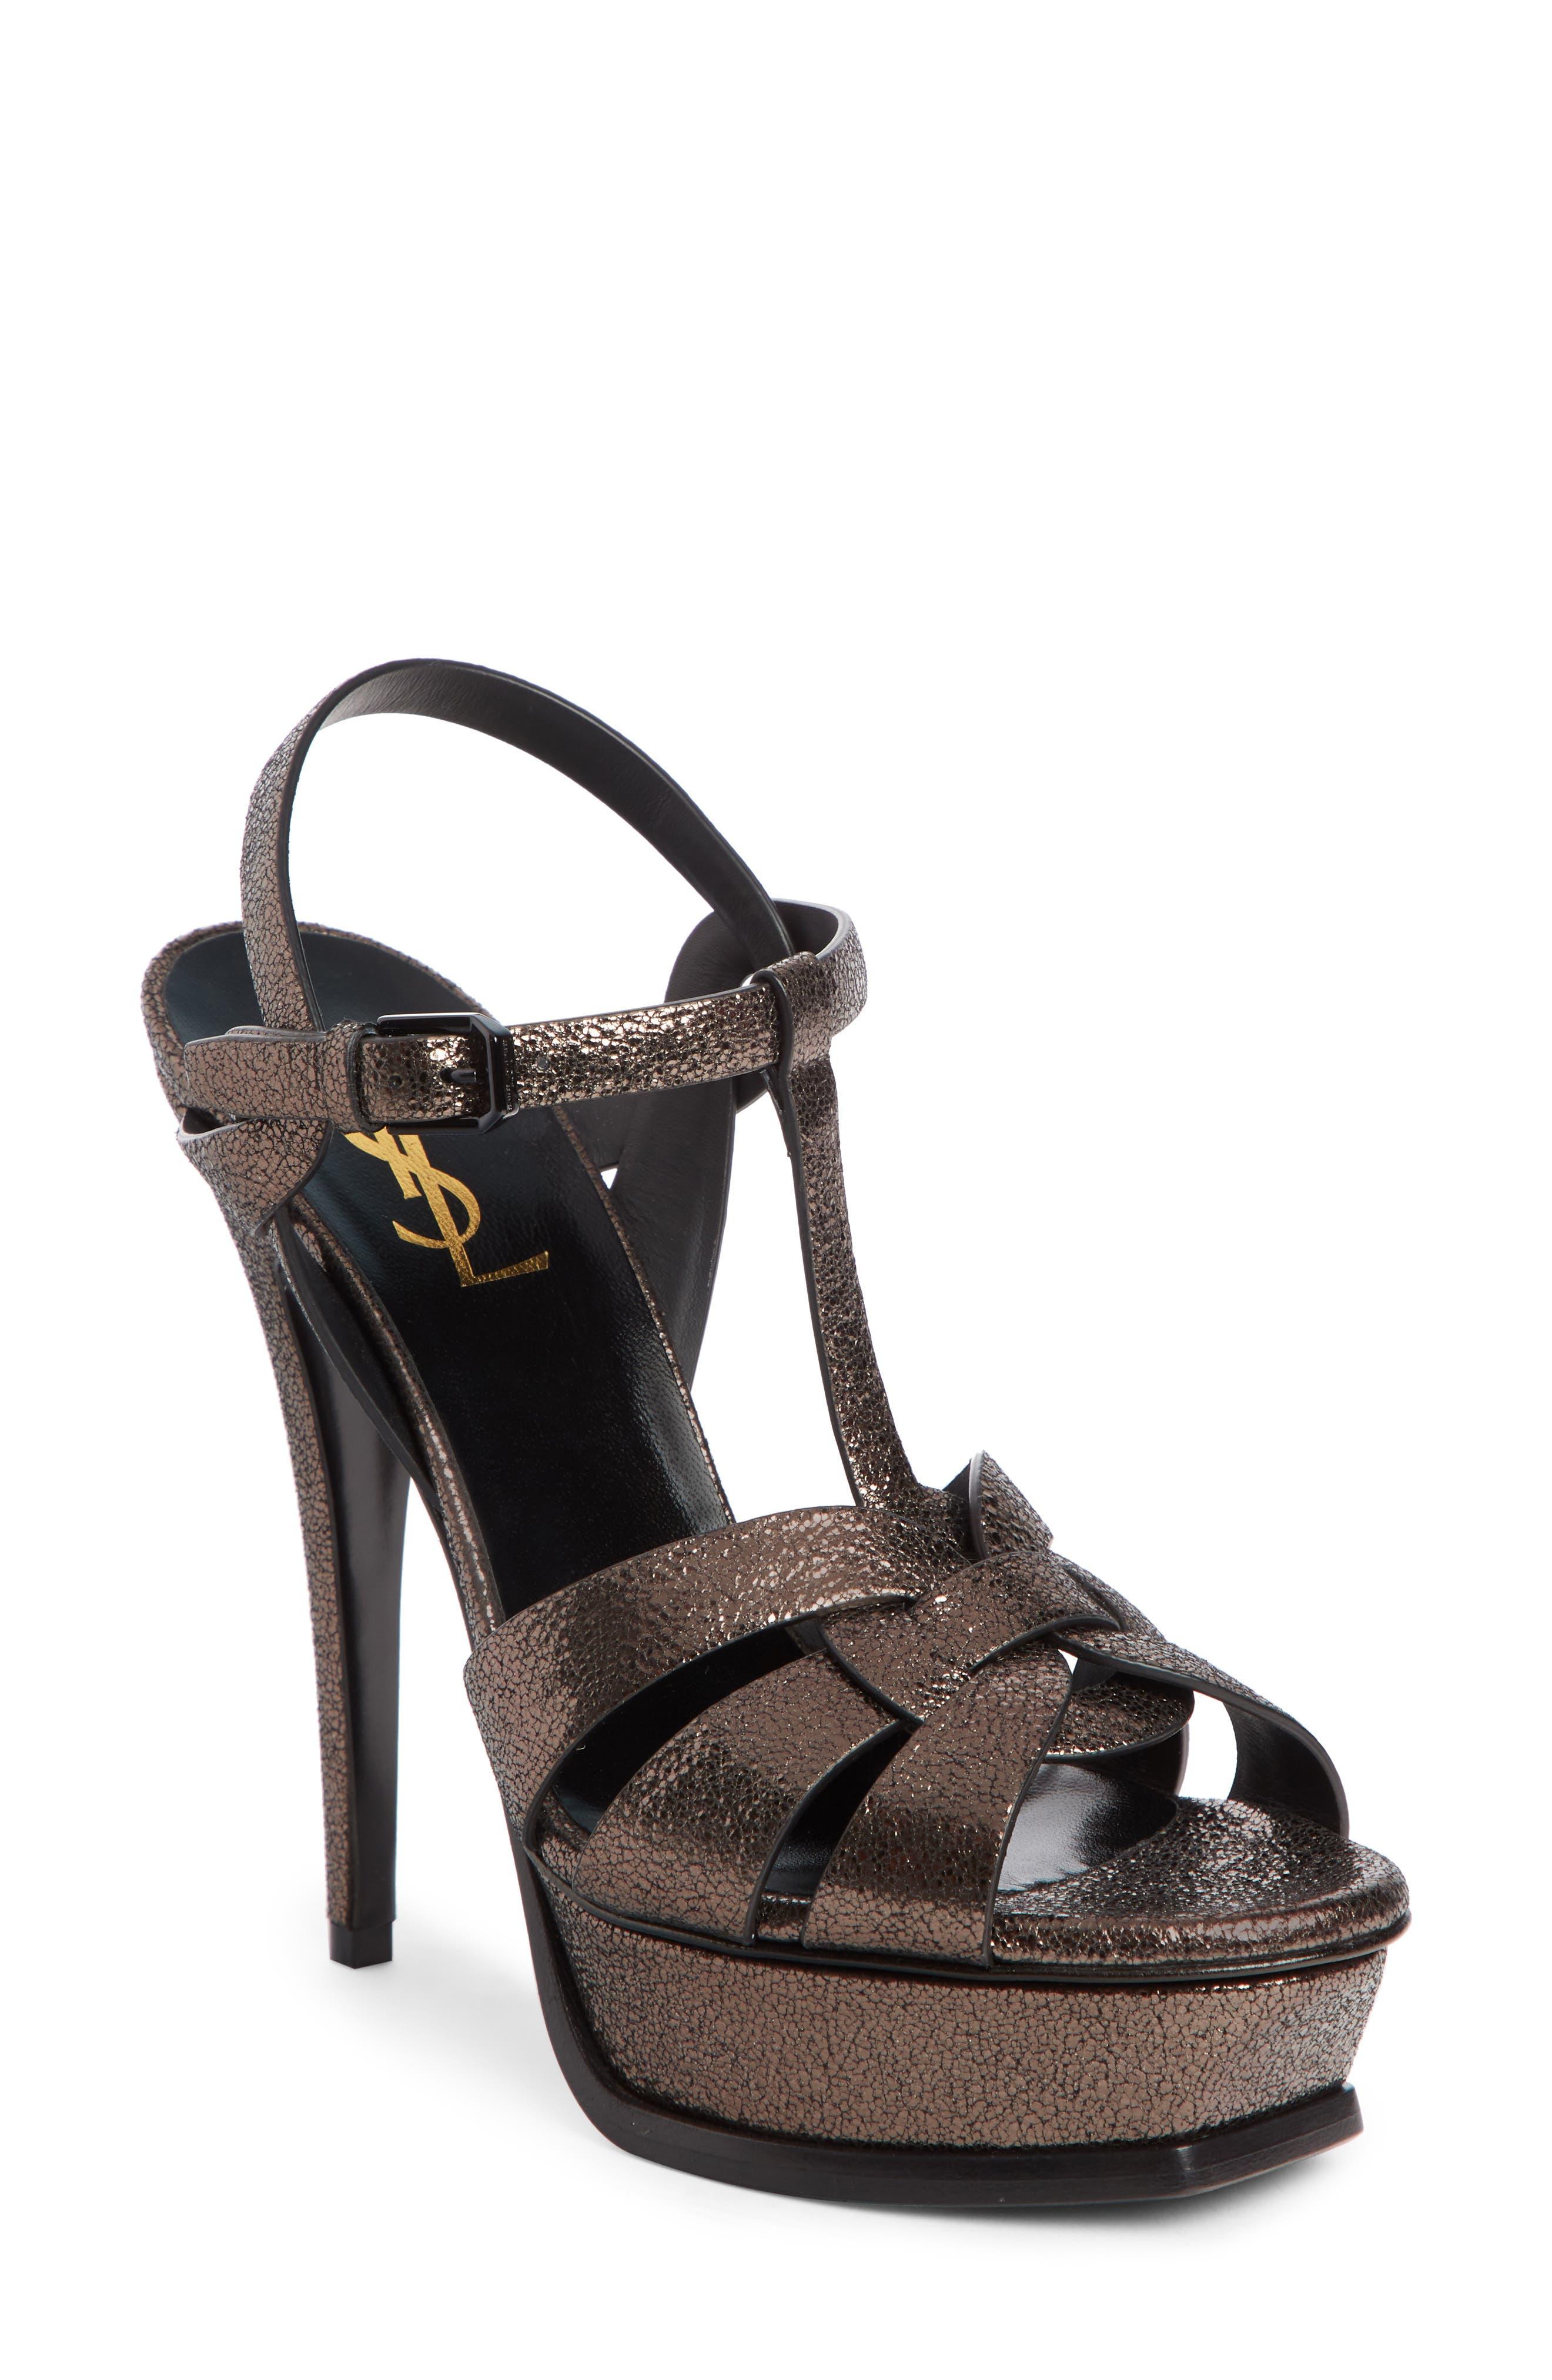 Tribute Speckled Metallic Platform Sandals in Black